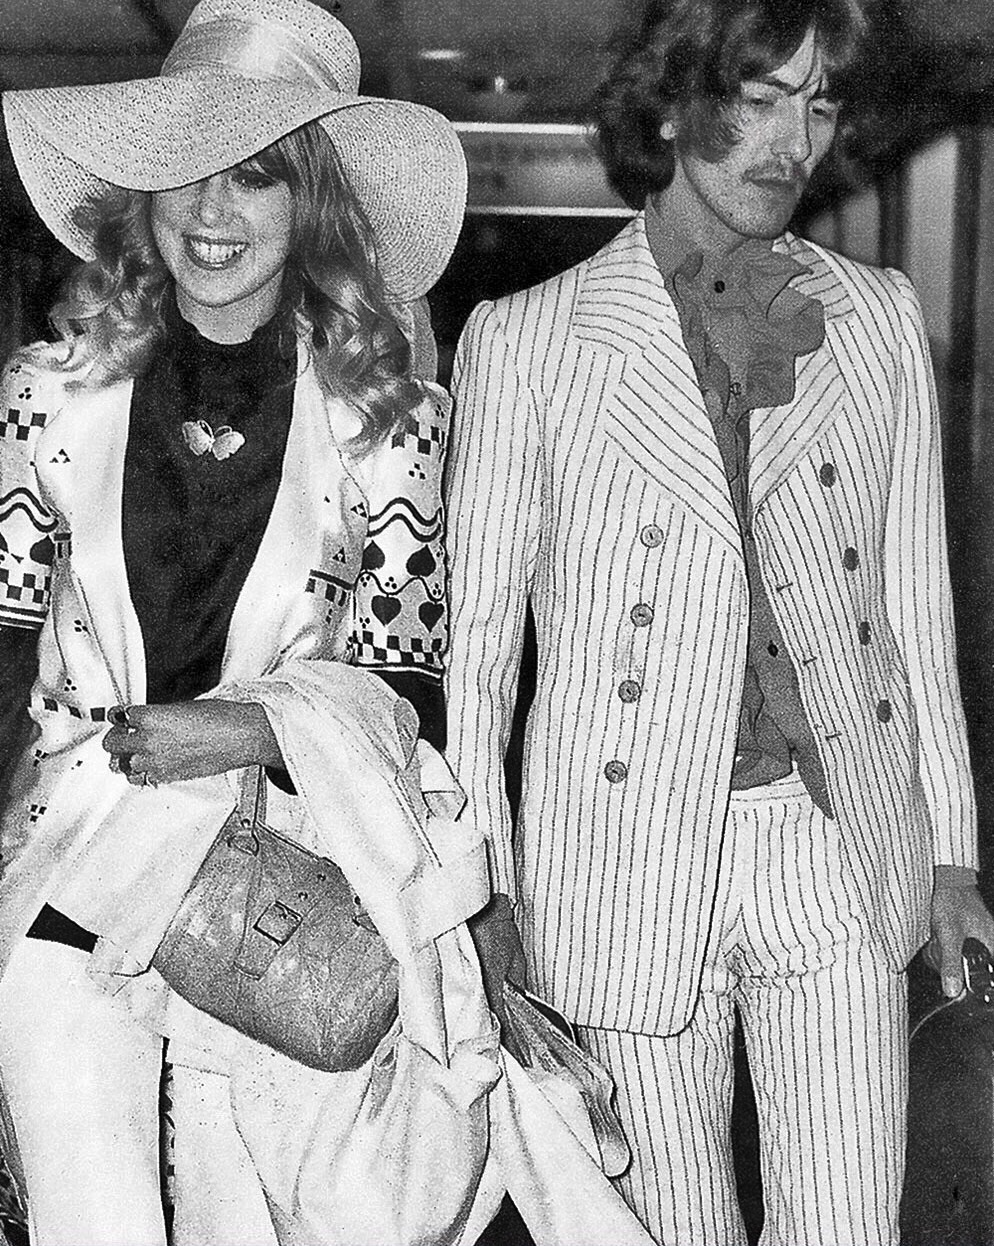 George Harrison with Pattie Boyd, 1968.